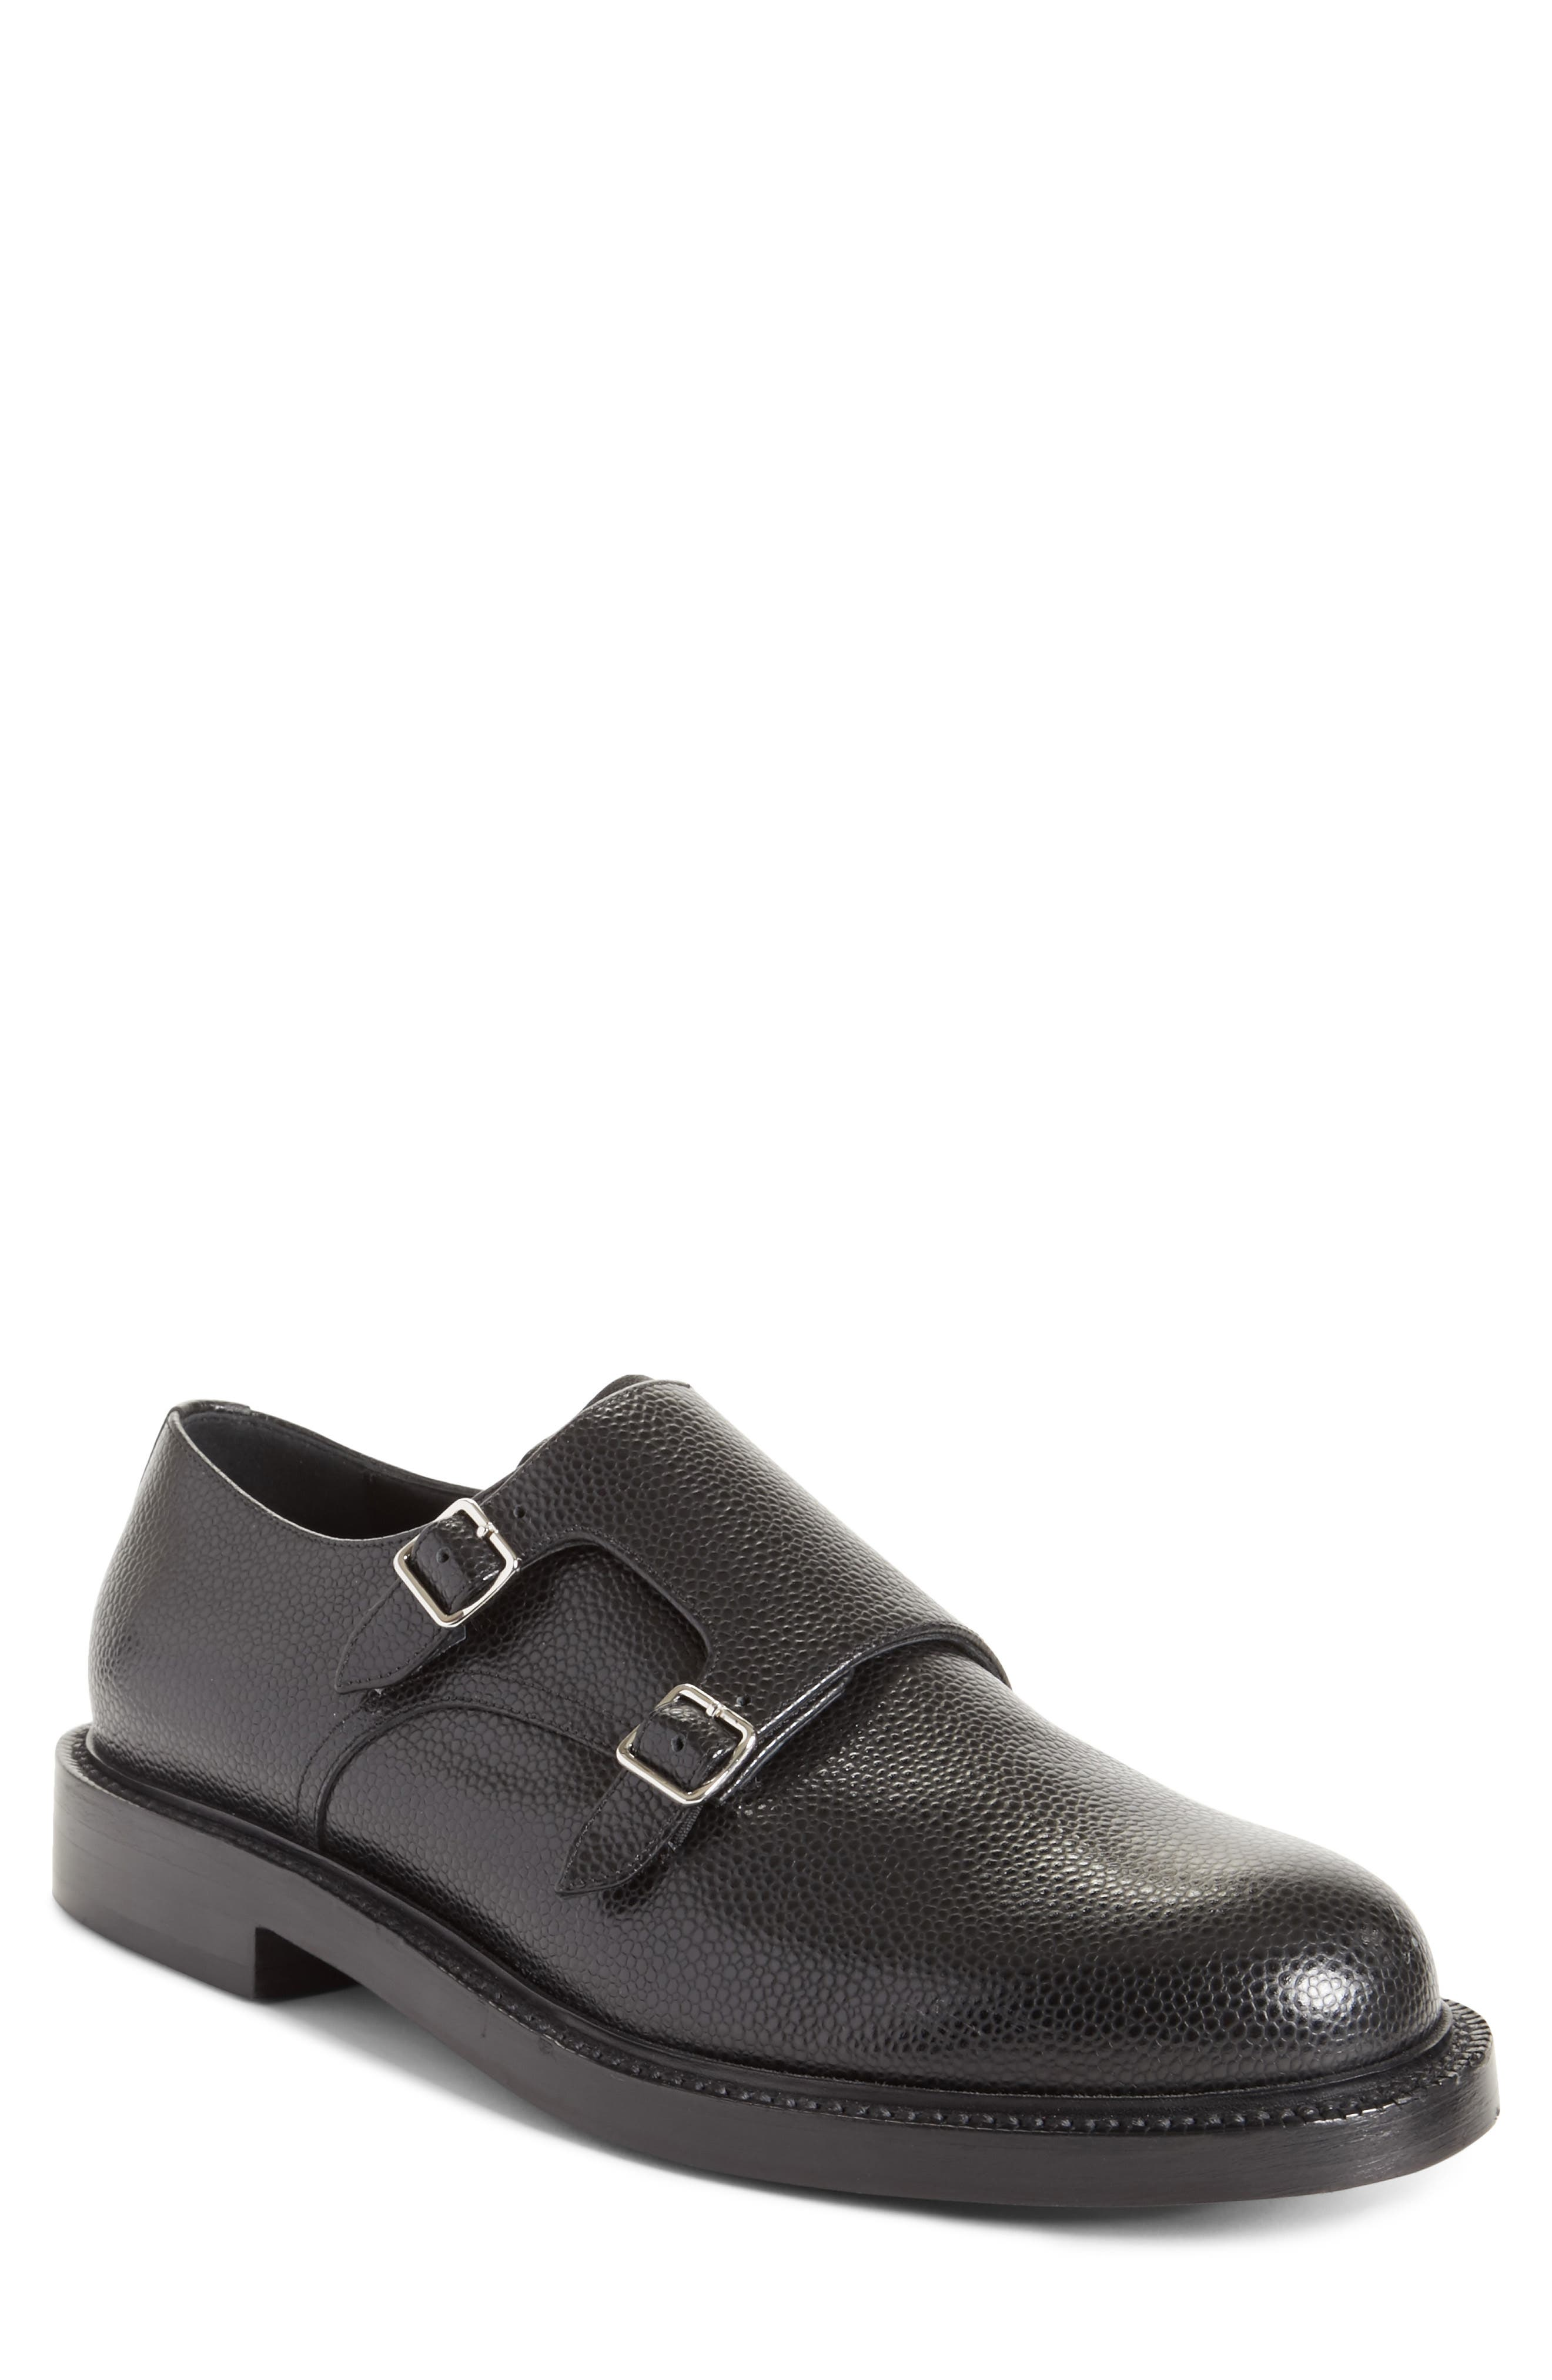 Hova Double Monk Strap Shoe,                             Main thumbnail 1, color,                             Black Leather